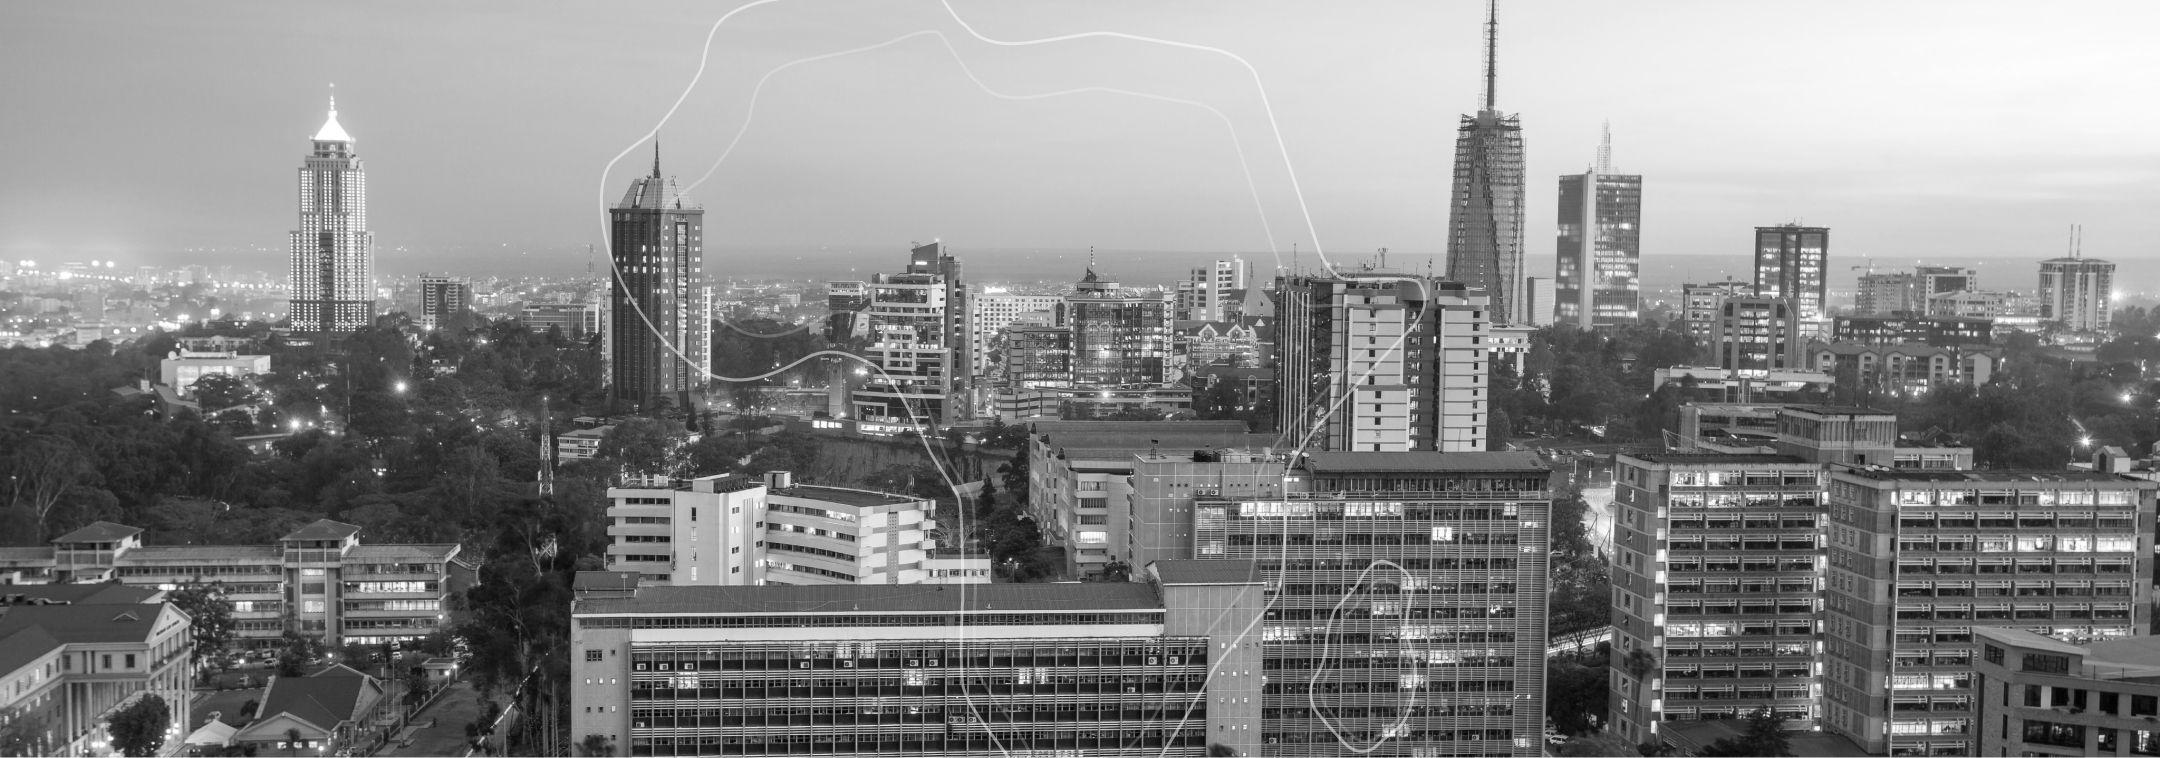 LHH Africa - Kenya